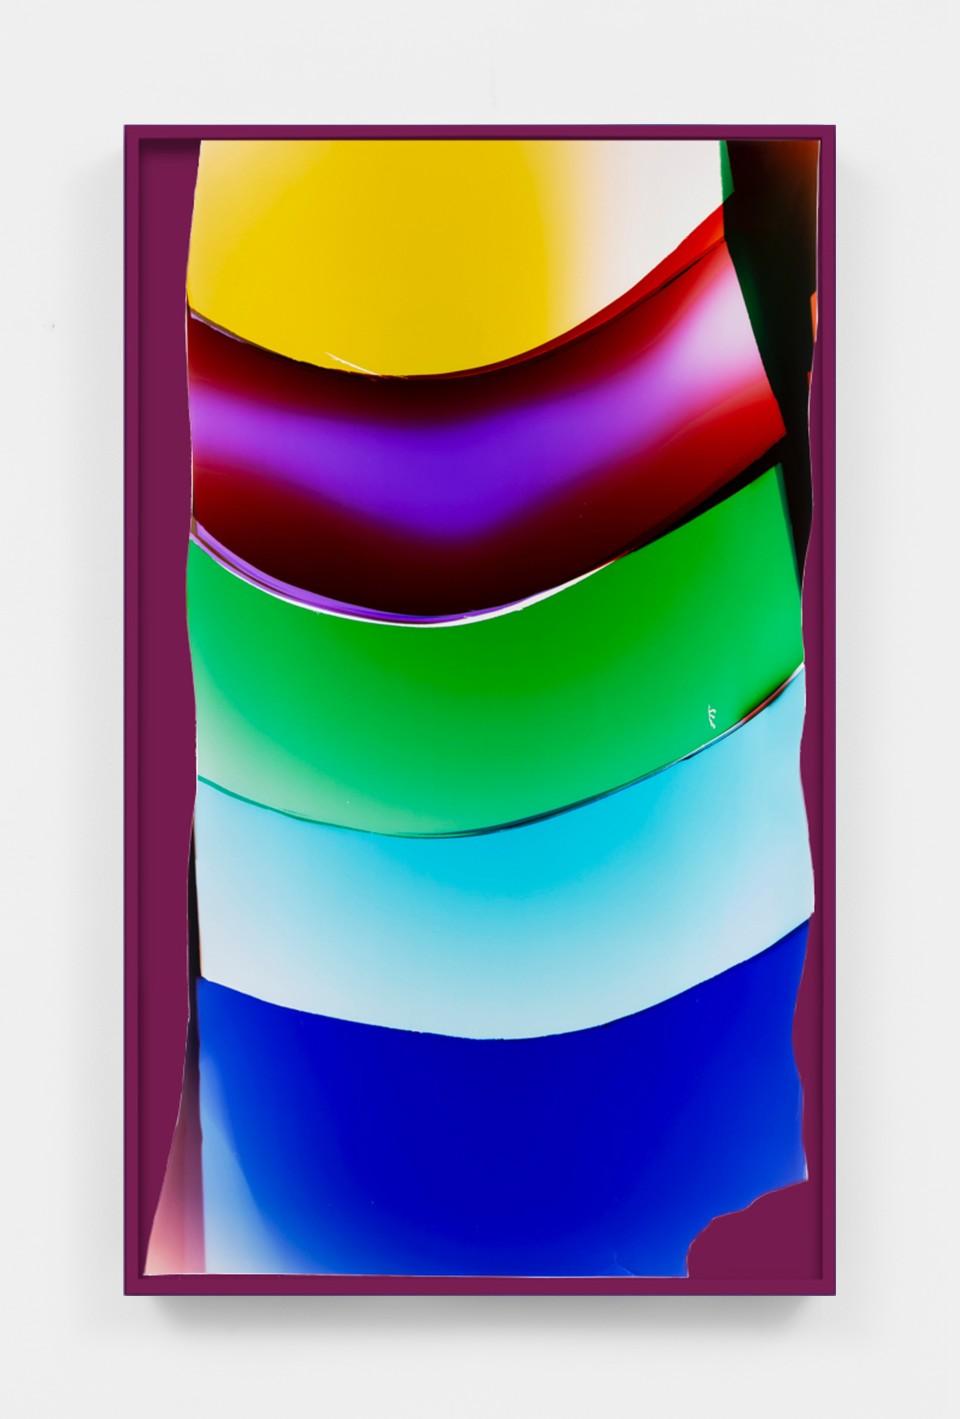 Image: Mariah Robertson  118, 2020  unique chromogenic print  50 x 30 inches (127 x 76.2 cm) (approx)